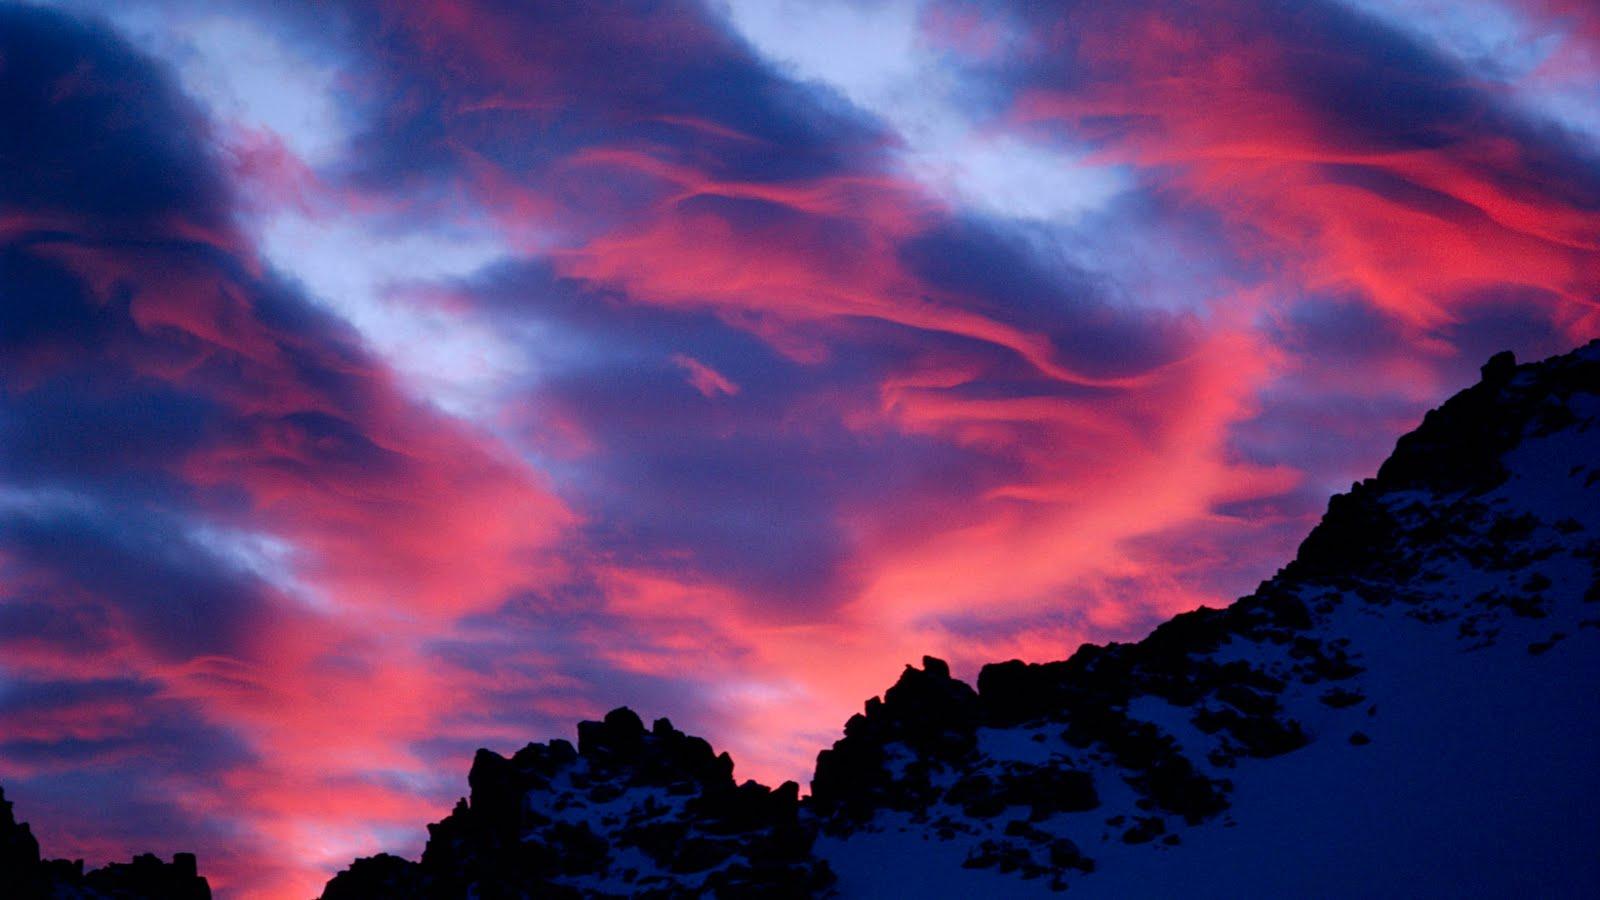 http://4.bp.blogspot.com/-R4ToccRXFDg/ThIyTwe4xWI/AAAAAAAAKxc/BylXI5hAZAQ/s1600/Lenticular-Clouds-at-Sunset-Over-Lamarck-Col-Sierra-Nevada-Mountains-California.jpg